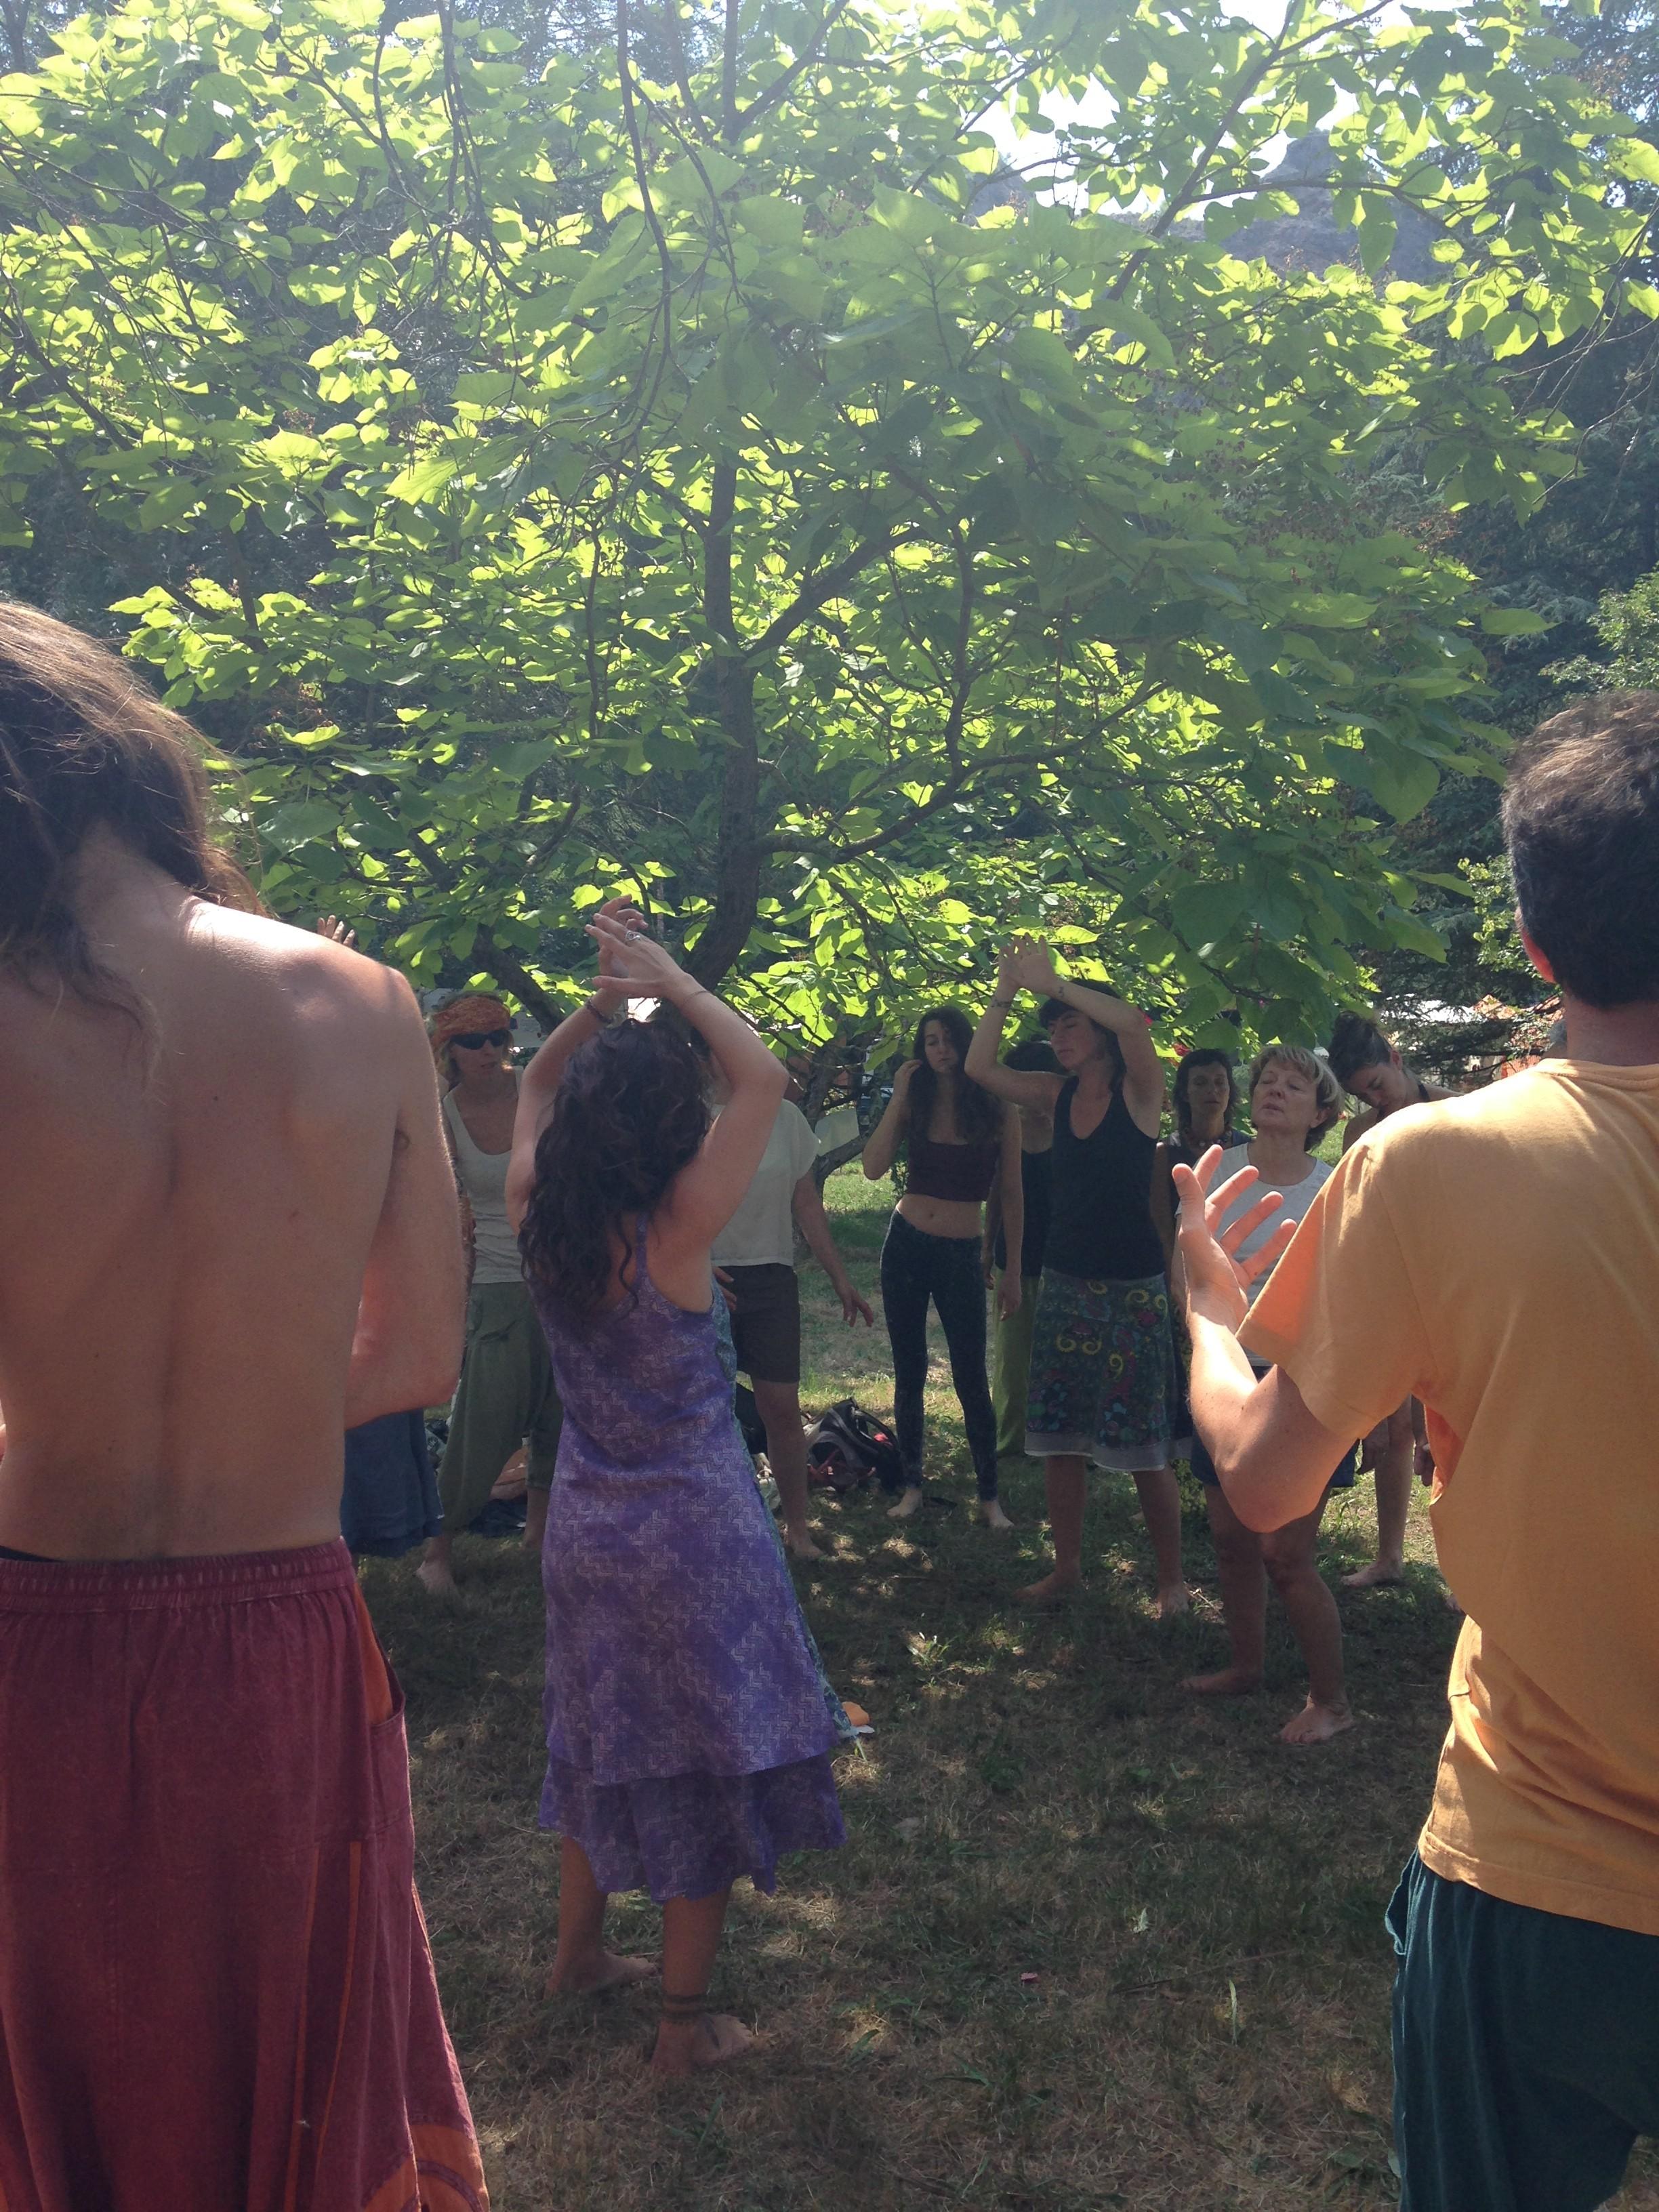 26-29 juin - Mantra Fest